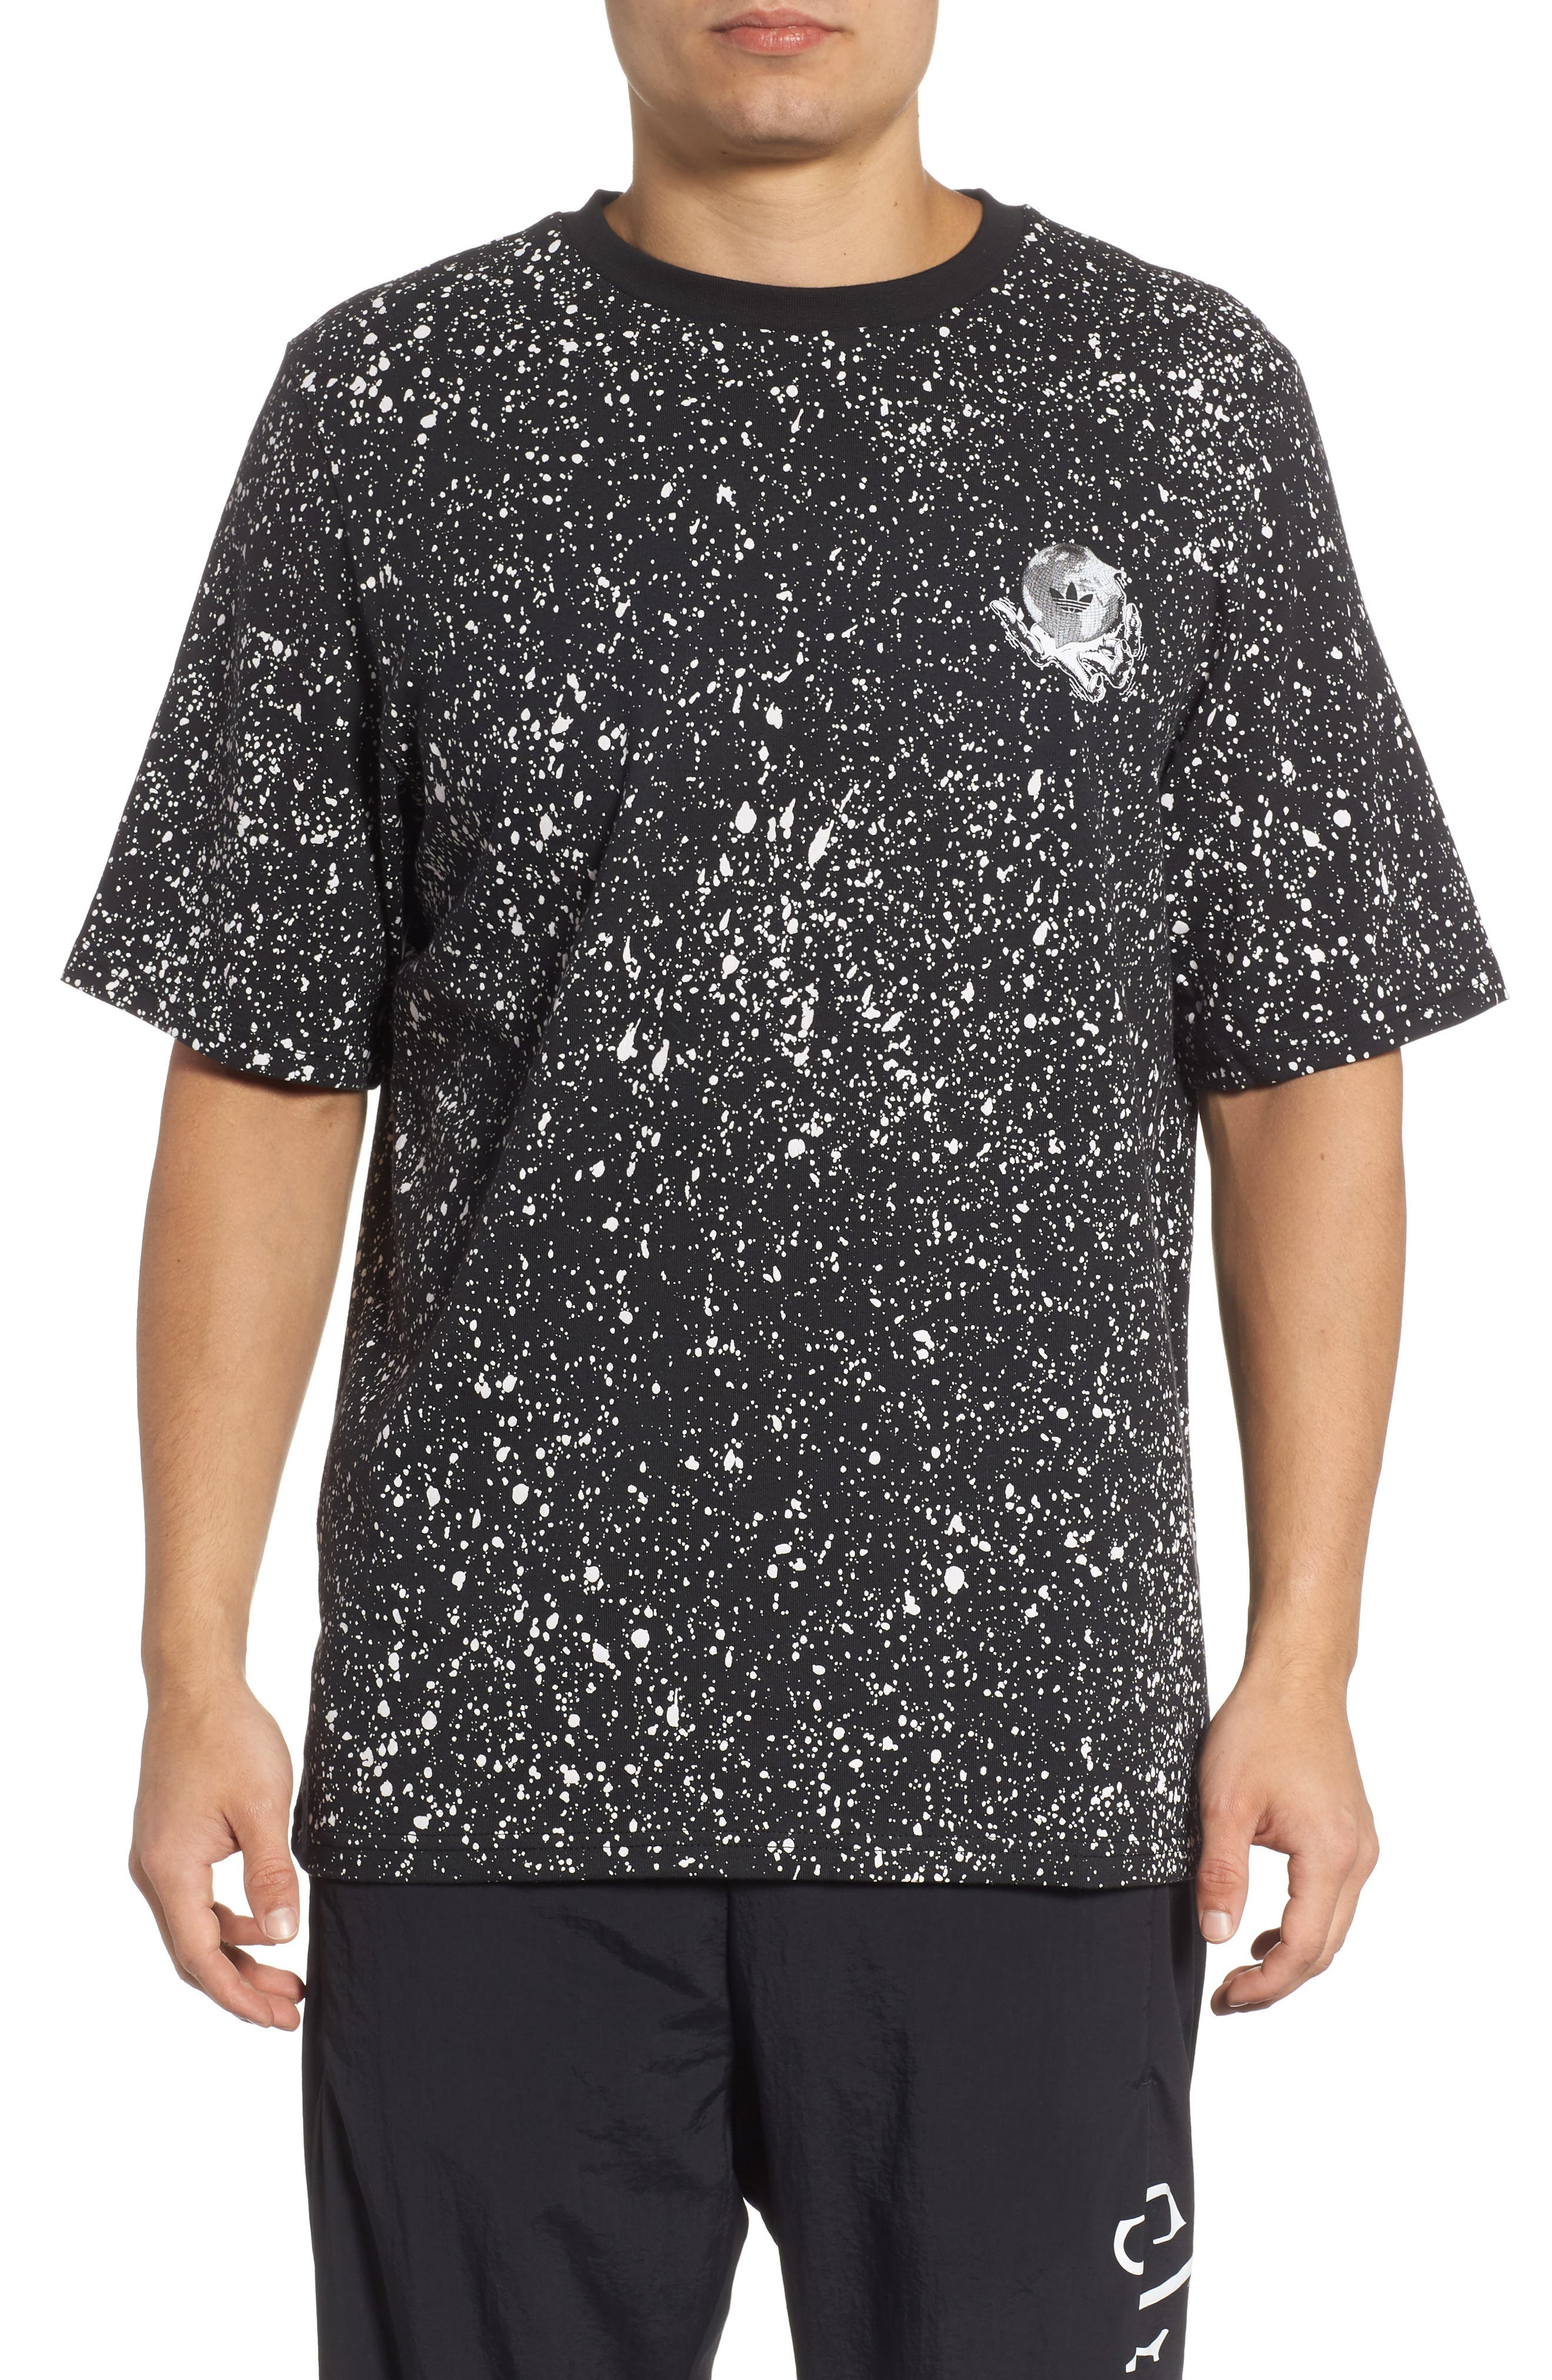 Planetoid Allover Print T-Shirt,                             Main thumbnail 1, color,                             BLACK